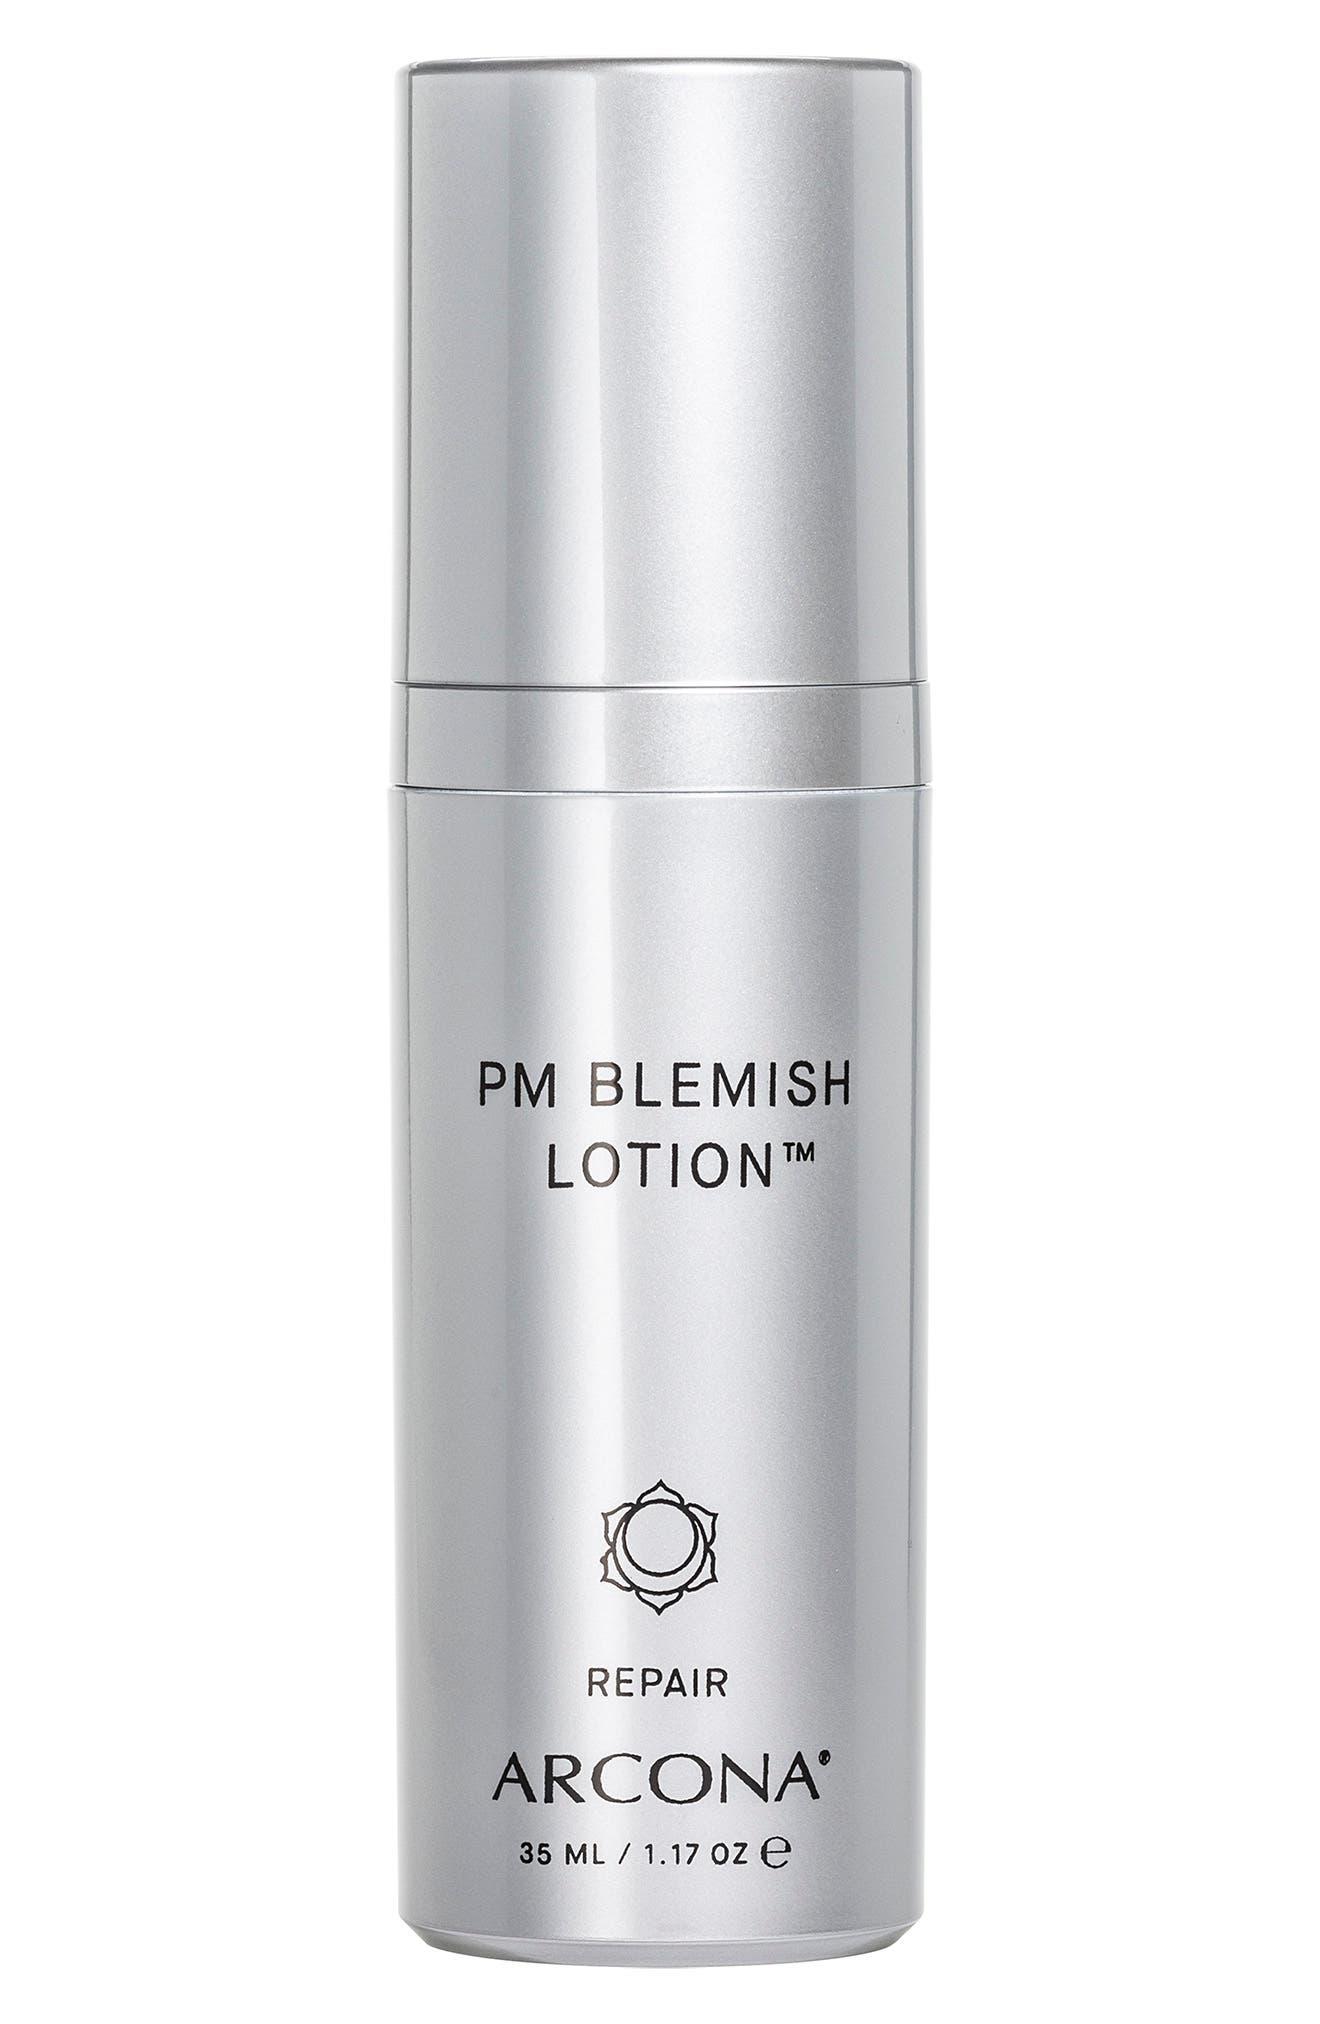 Pm Blemish Lotion